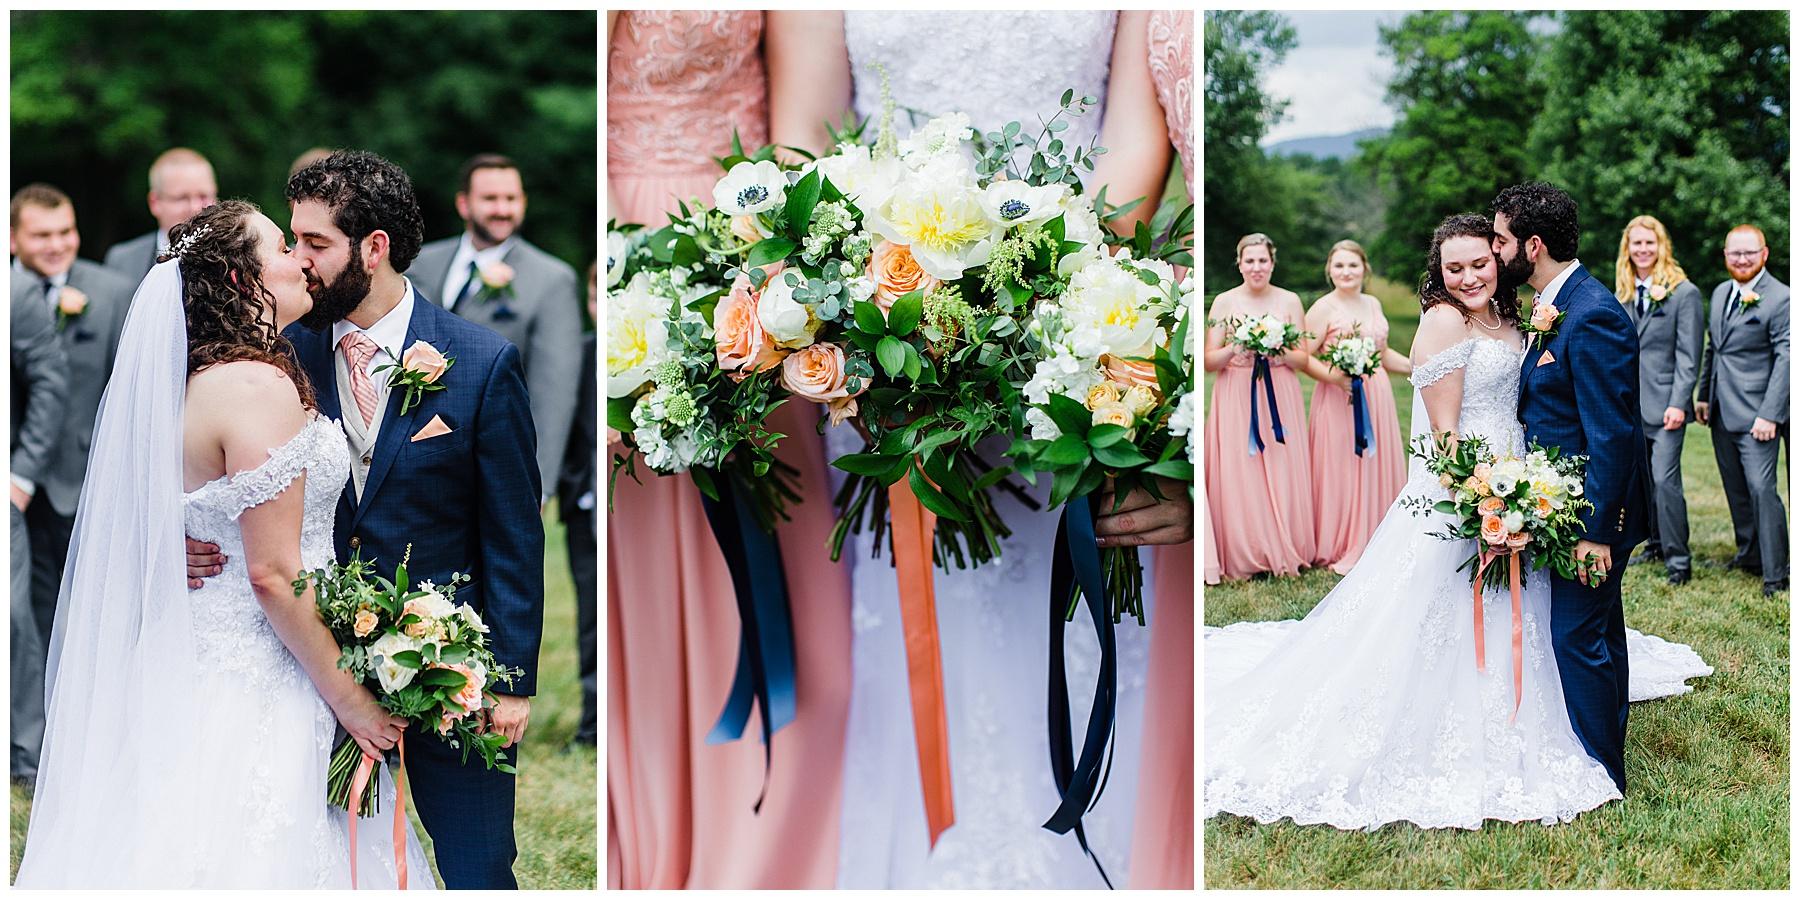 oak-ridge-estate-wedding-virginia-photographer23.jpg